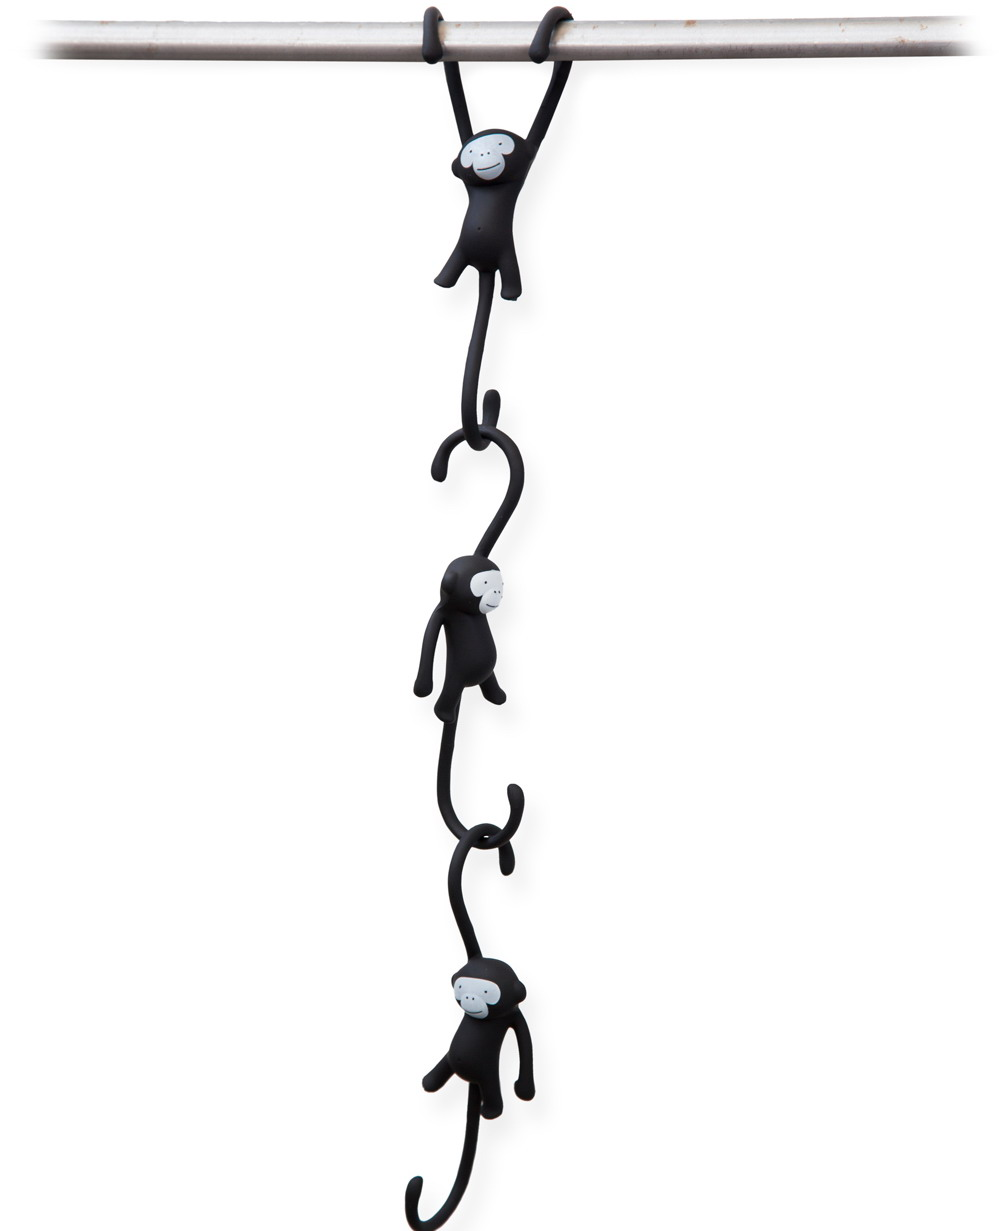 just-hanging-4